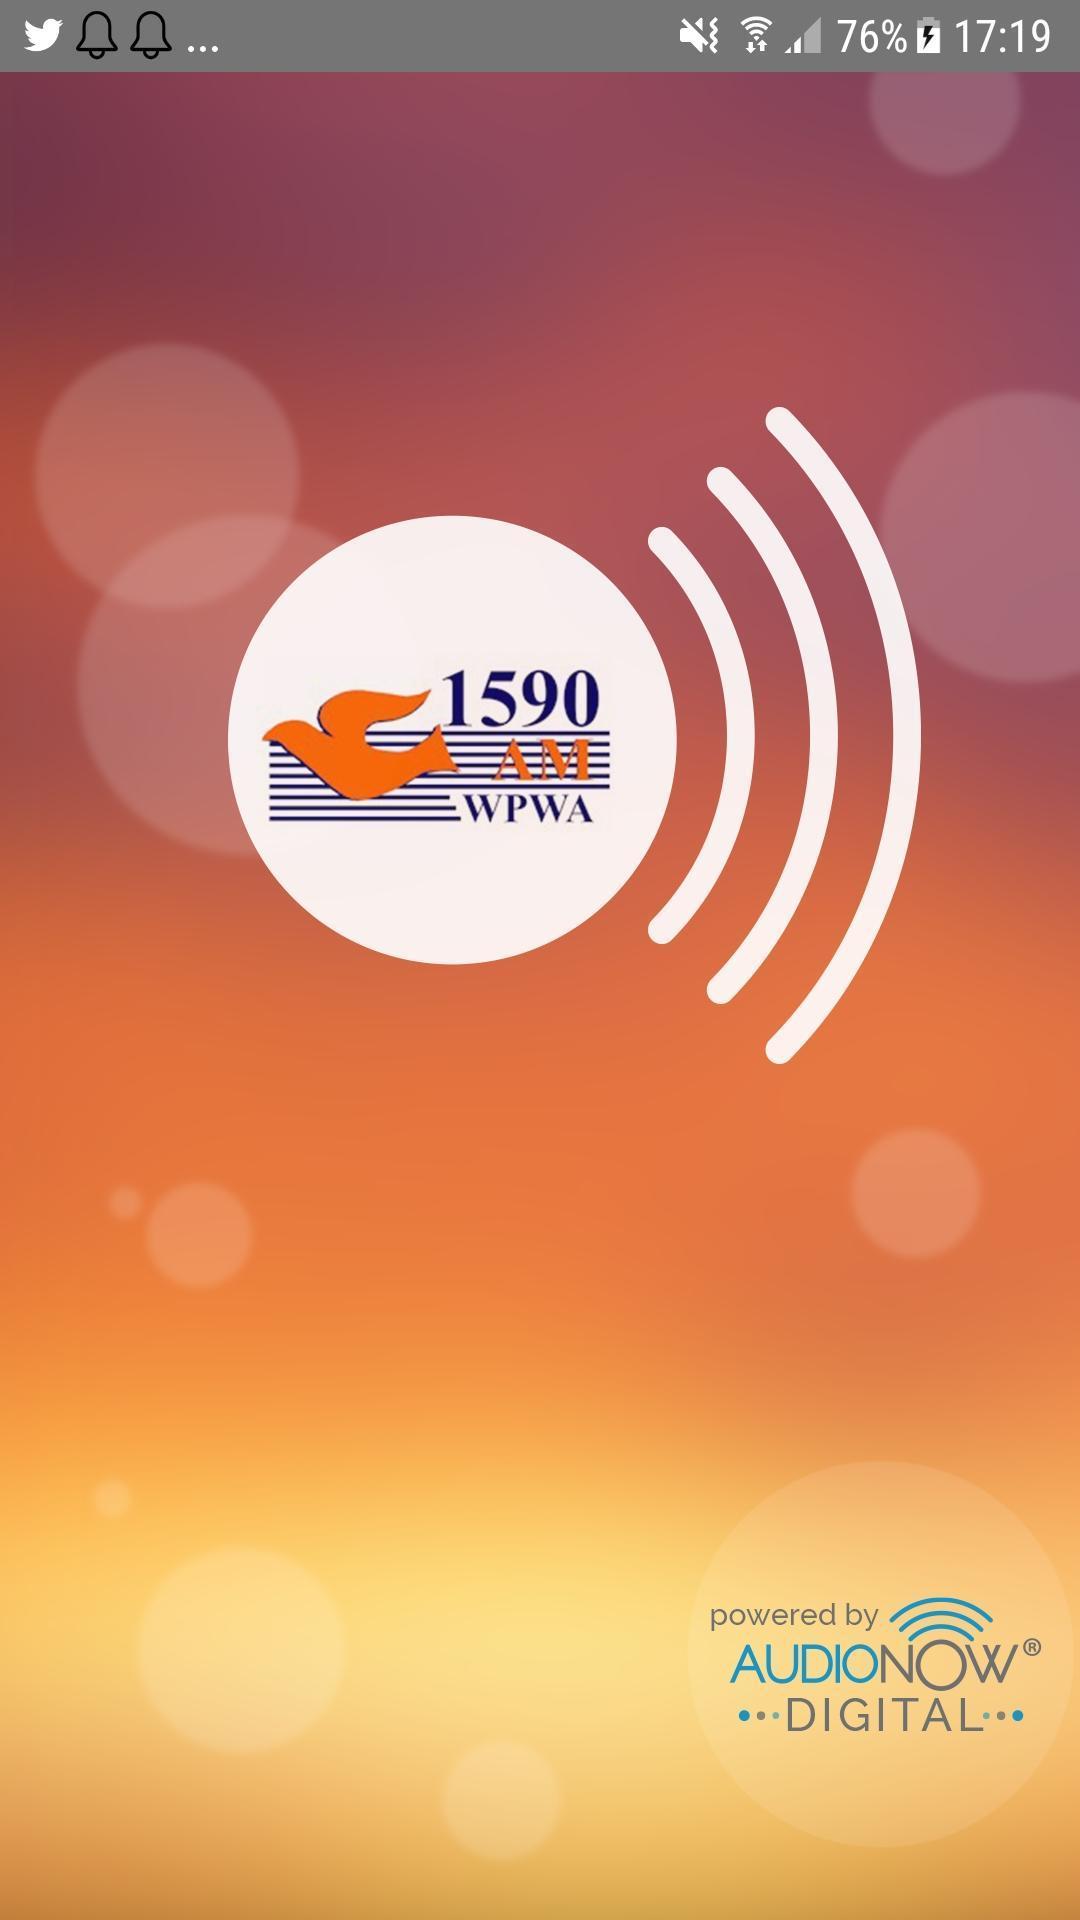 Android 用の WPWA APK をダウンロード